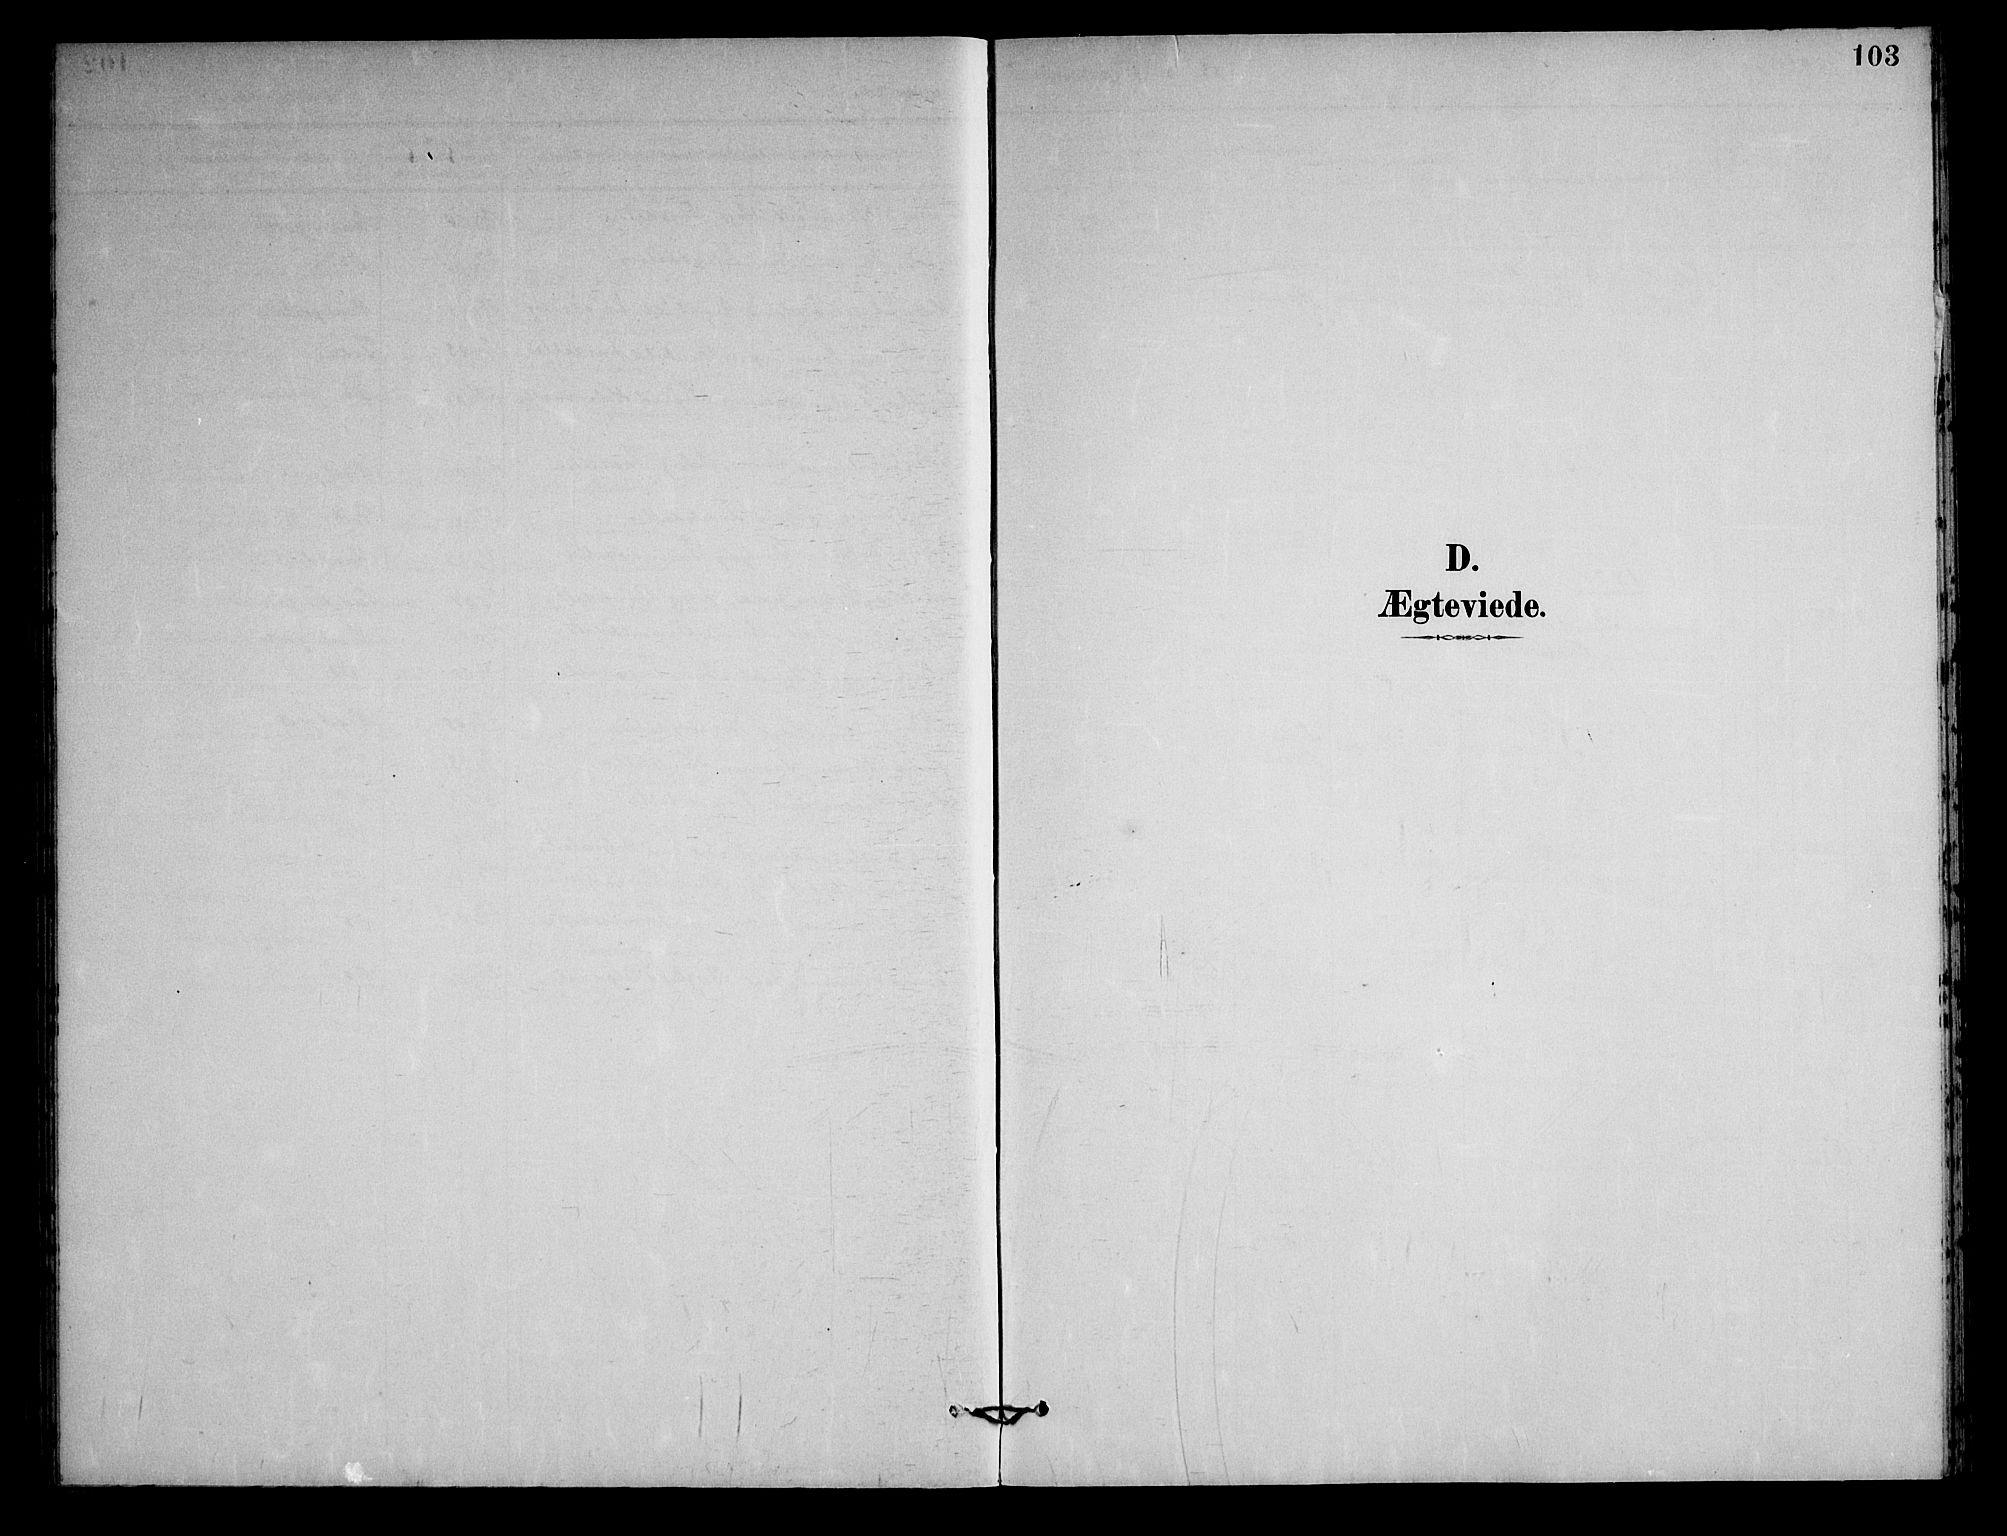 SAKO, Nissedal kirkebøker, G/Gb/L0003: Klokkerbok nr. II 3, 1893-1928, s. 103